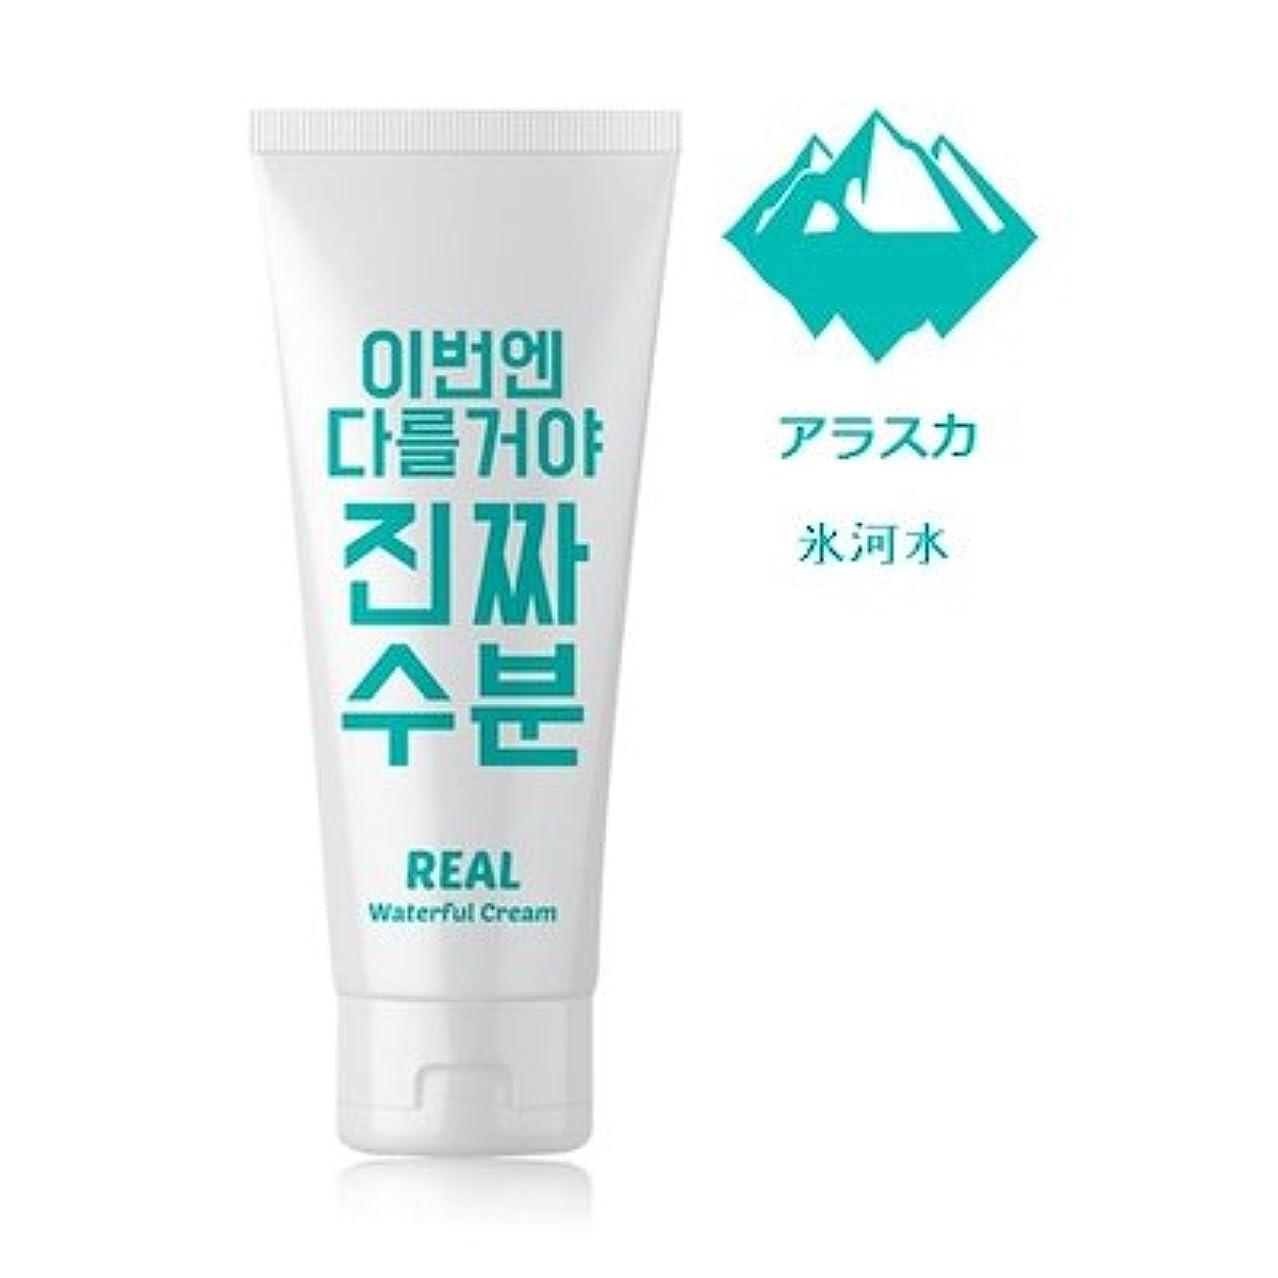 Jaminkyung Real Waterful Cream/孜民耕 [ジャミンギョン] 今度は違うぞ本当の水分クリーム 200ml [並行輸入品]